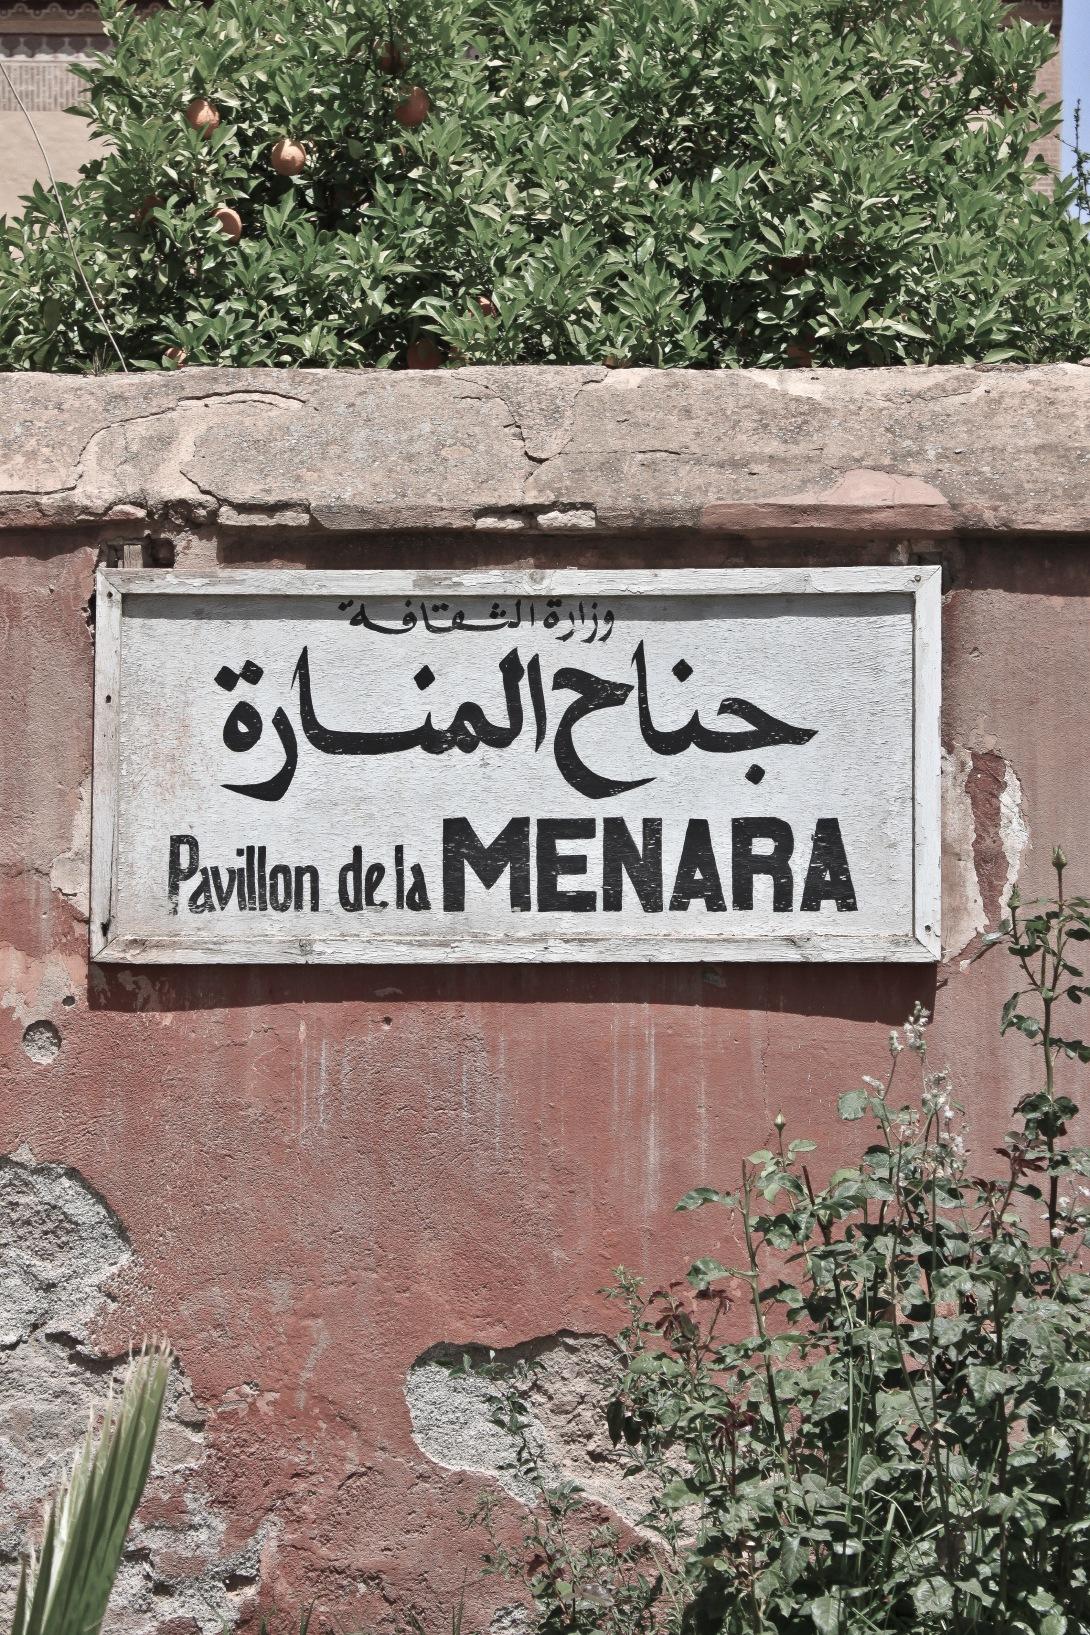 menara-gardens-no-4-day-in-the-city